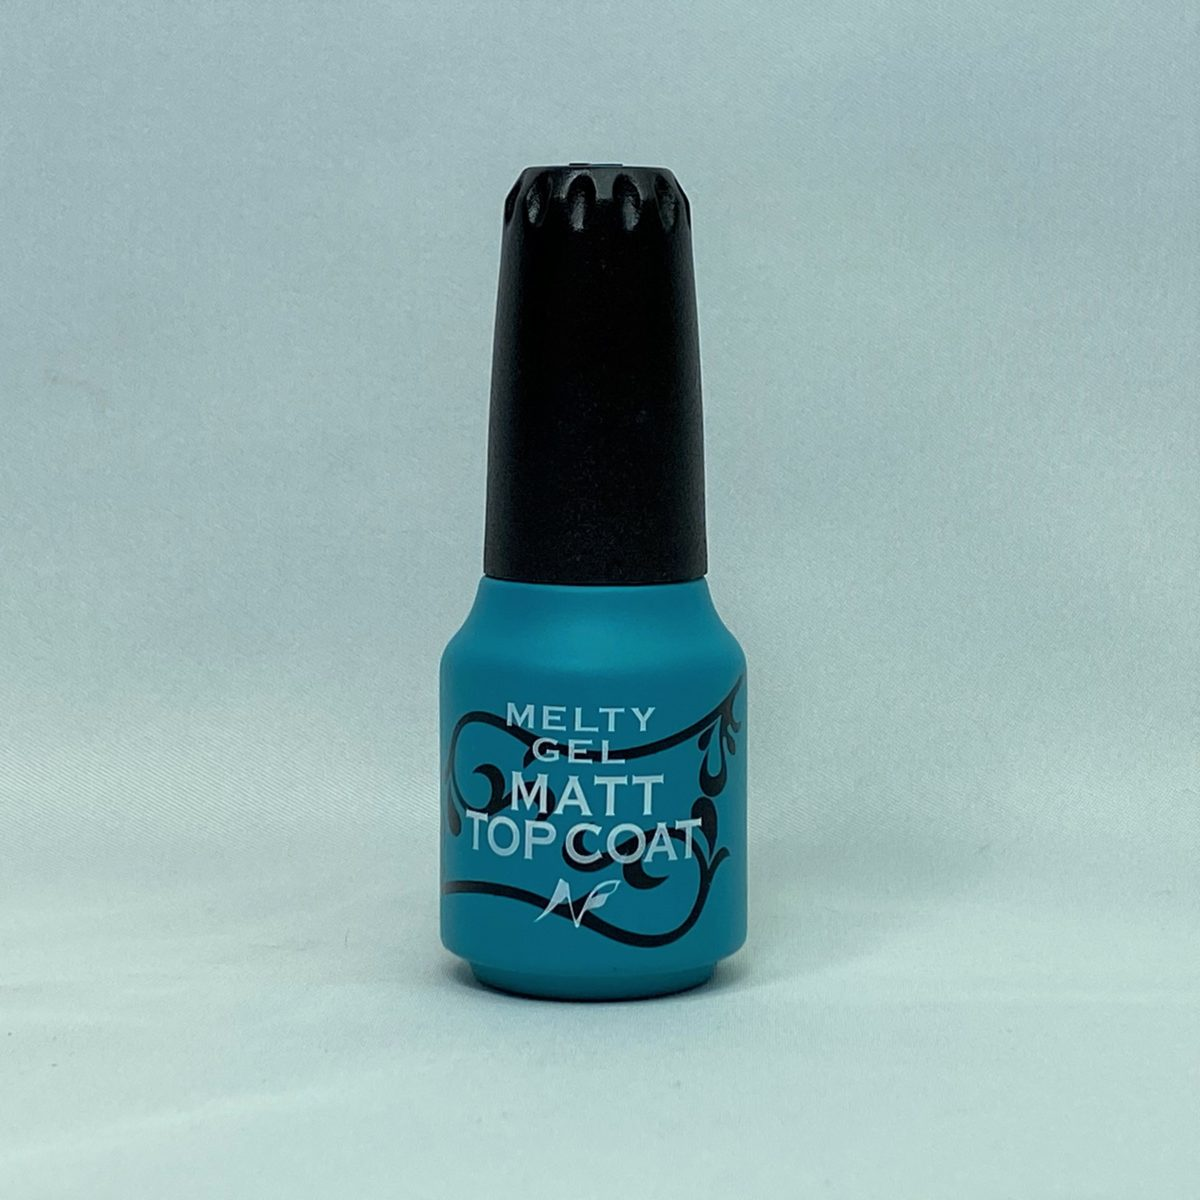 Melty Gel(メルティジェル)マットトップコート